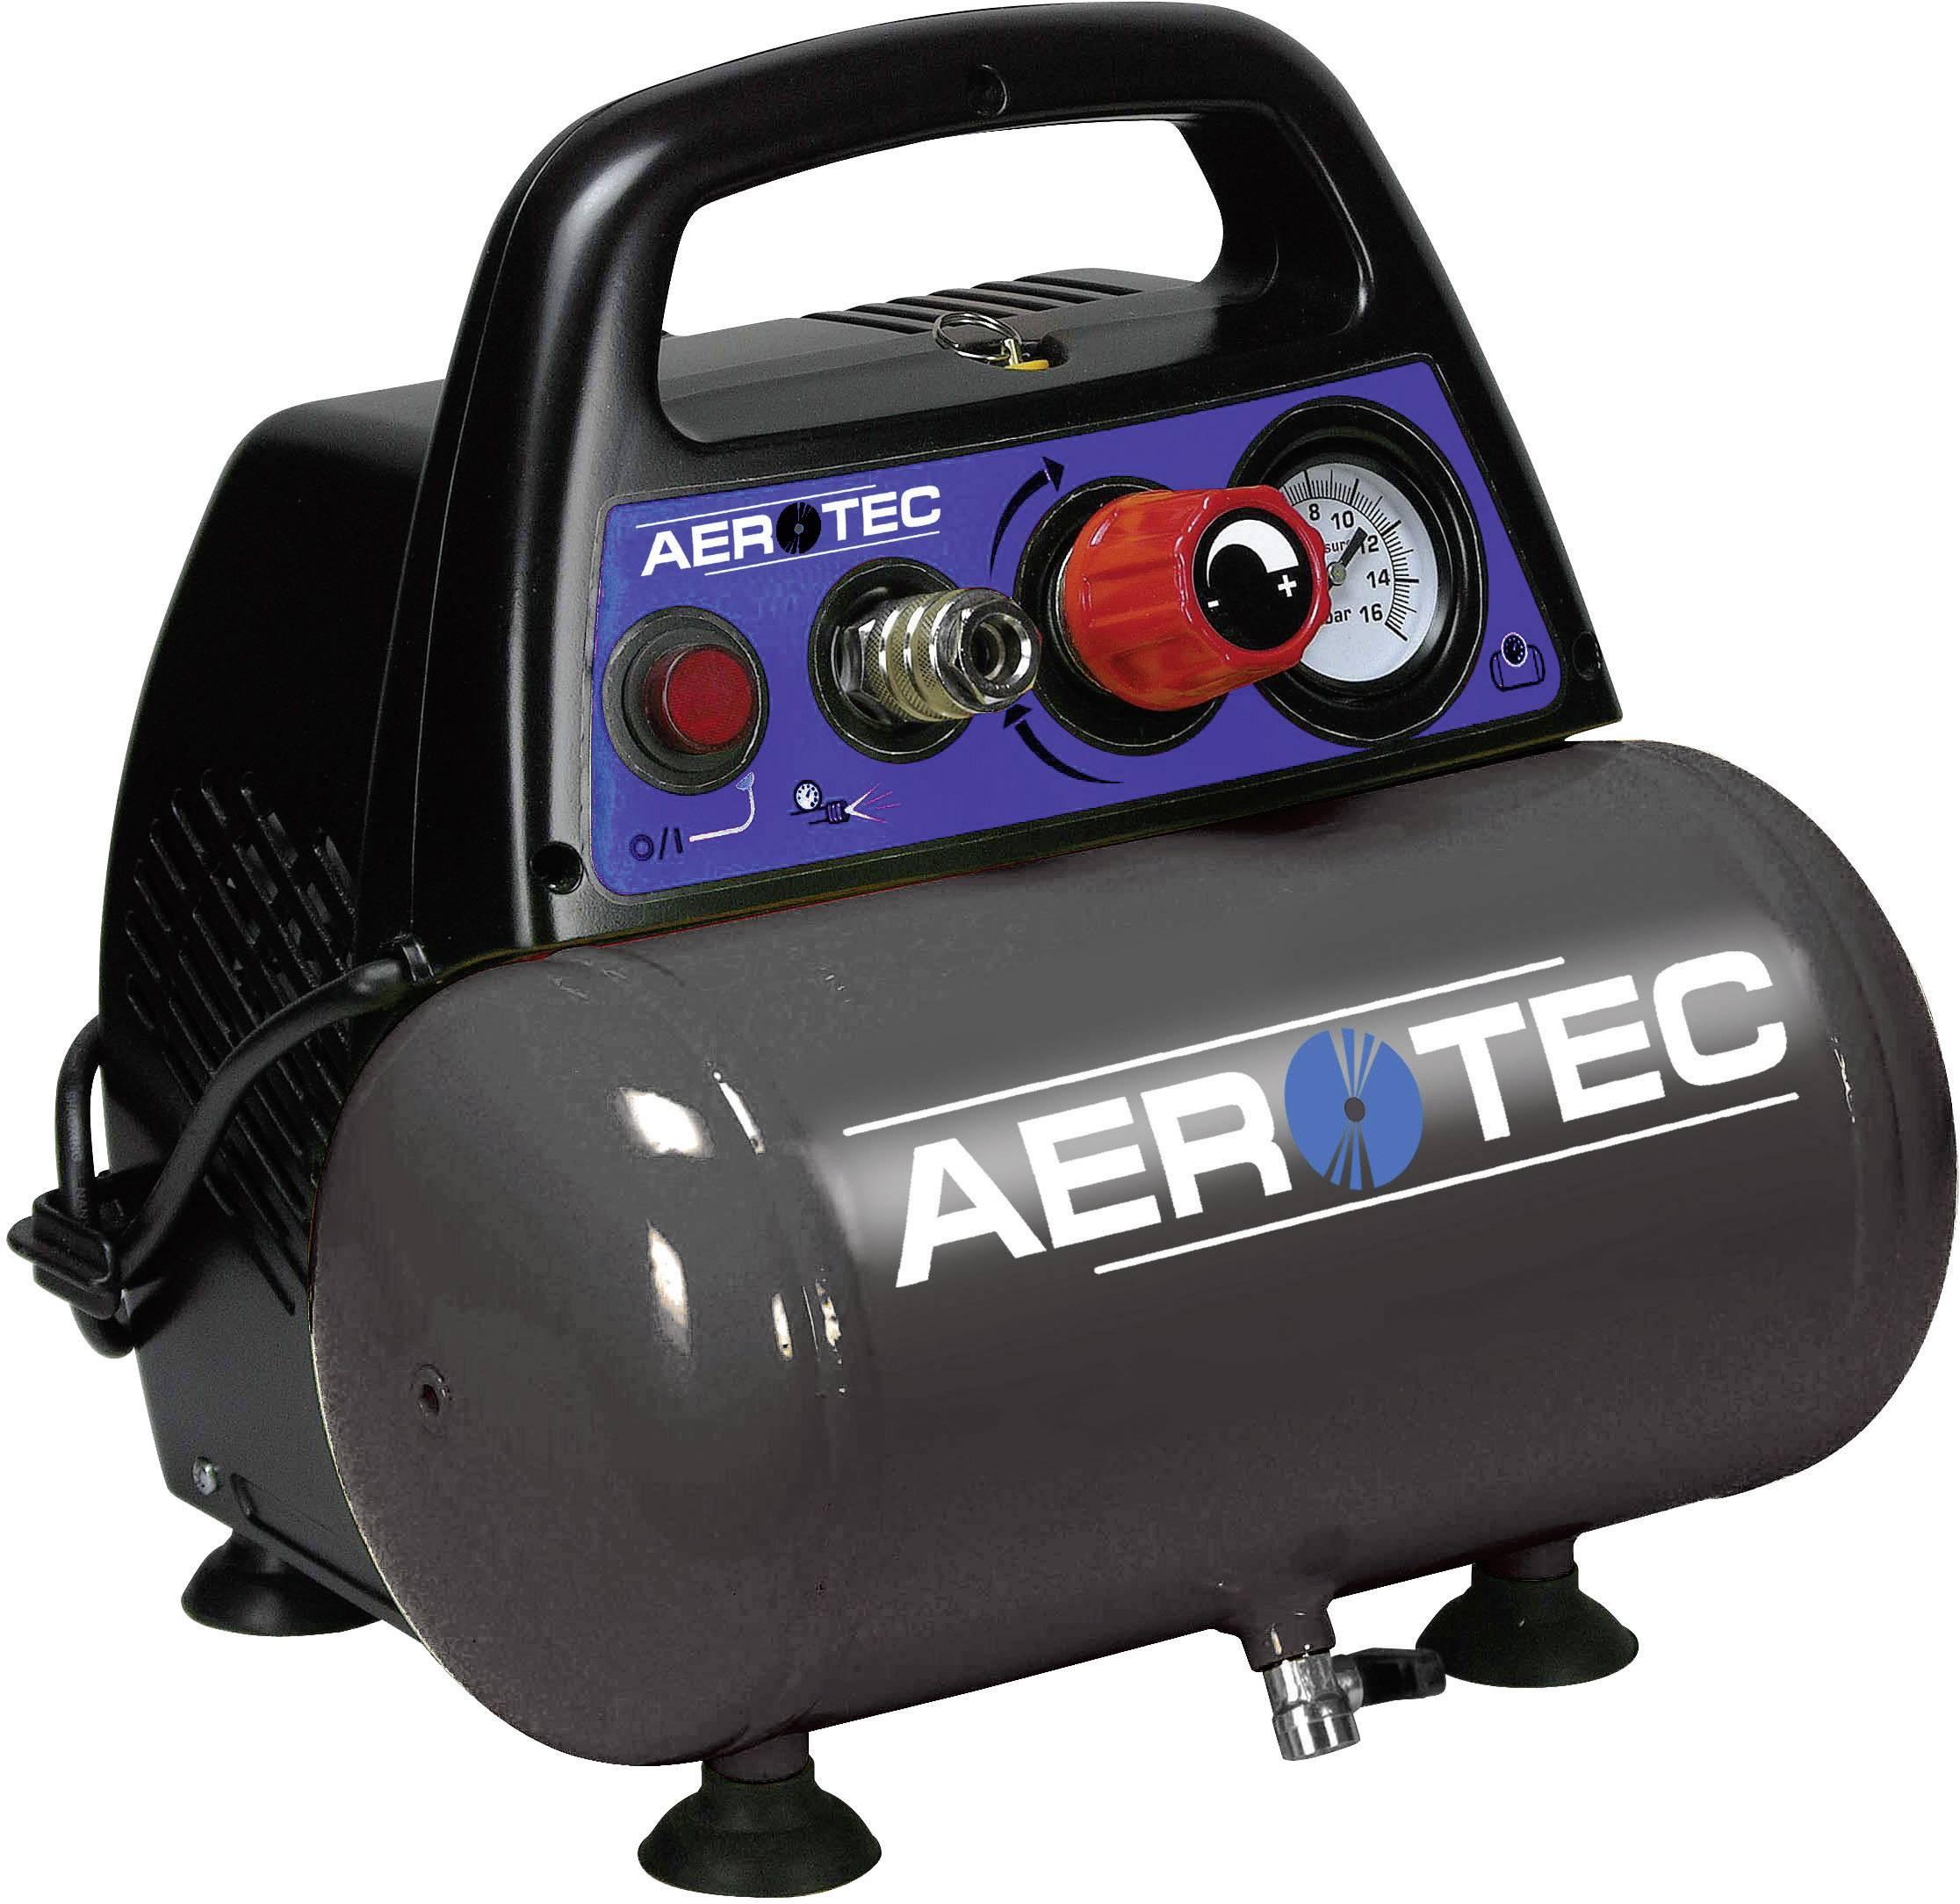 Pístový kompresor Aerotec Airliner 6 200664, objem tlak. nádoby 6 l